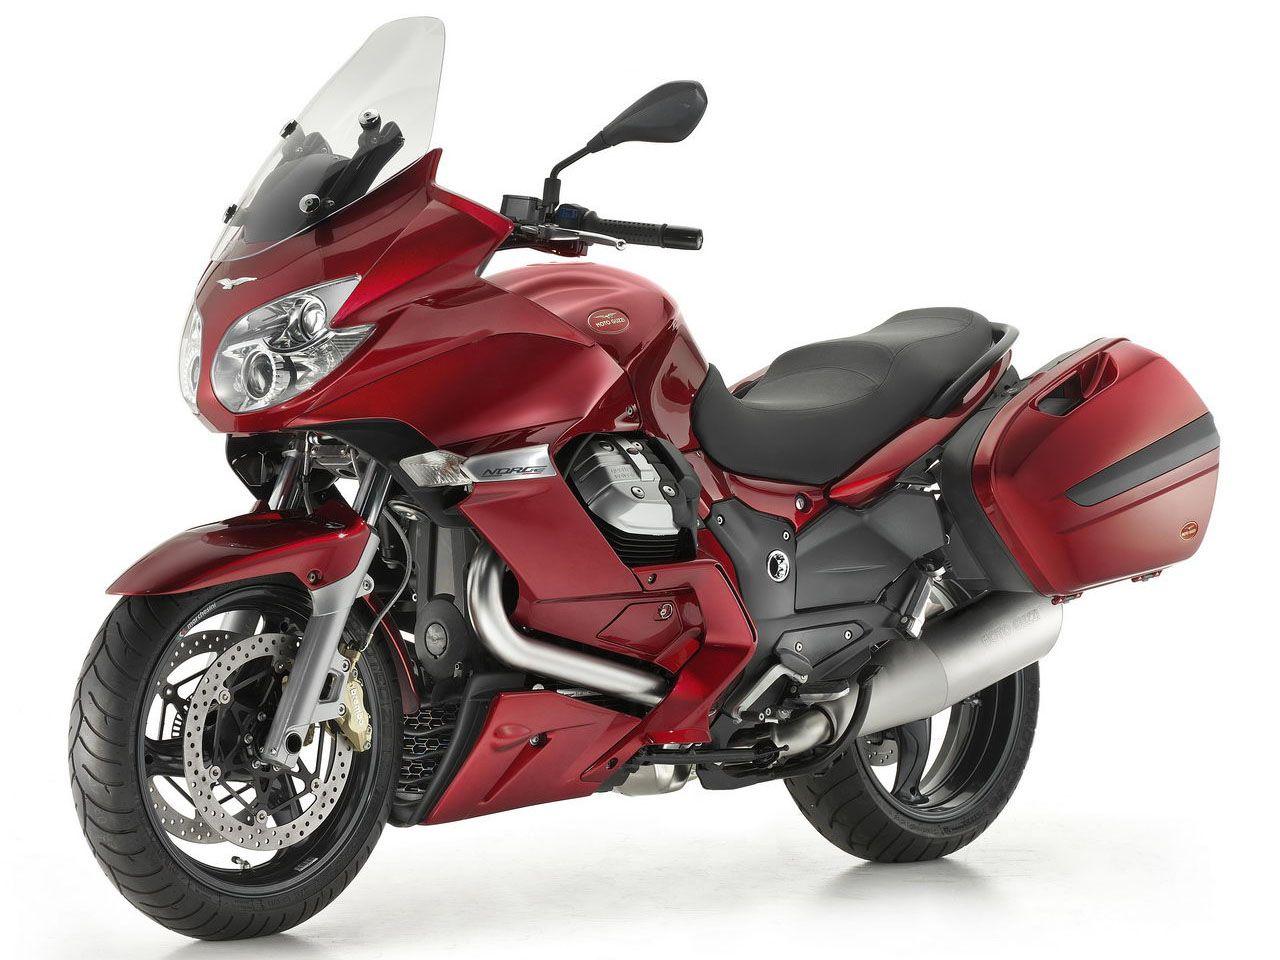 Nice Bike Ducati Sport Touring Moto guzzi, Moto guzzi